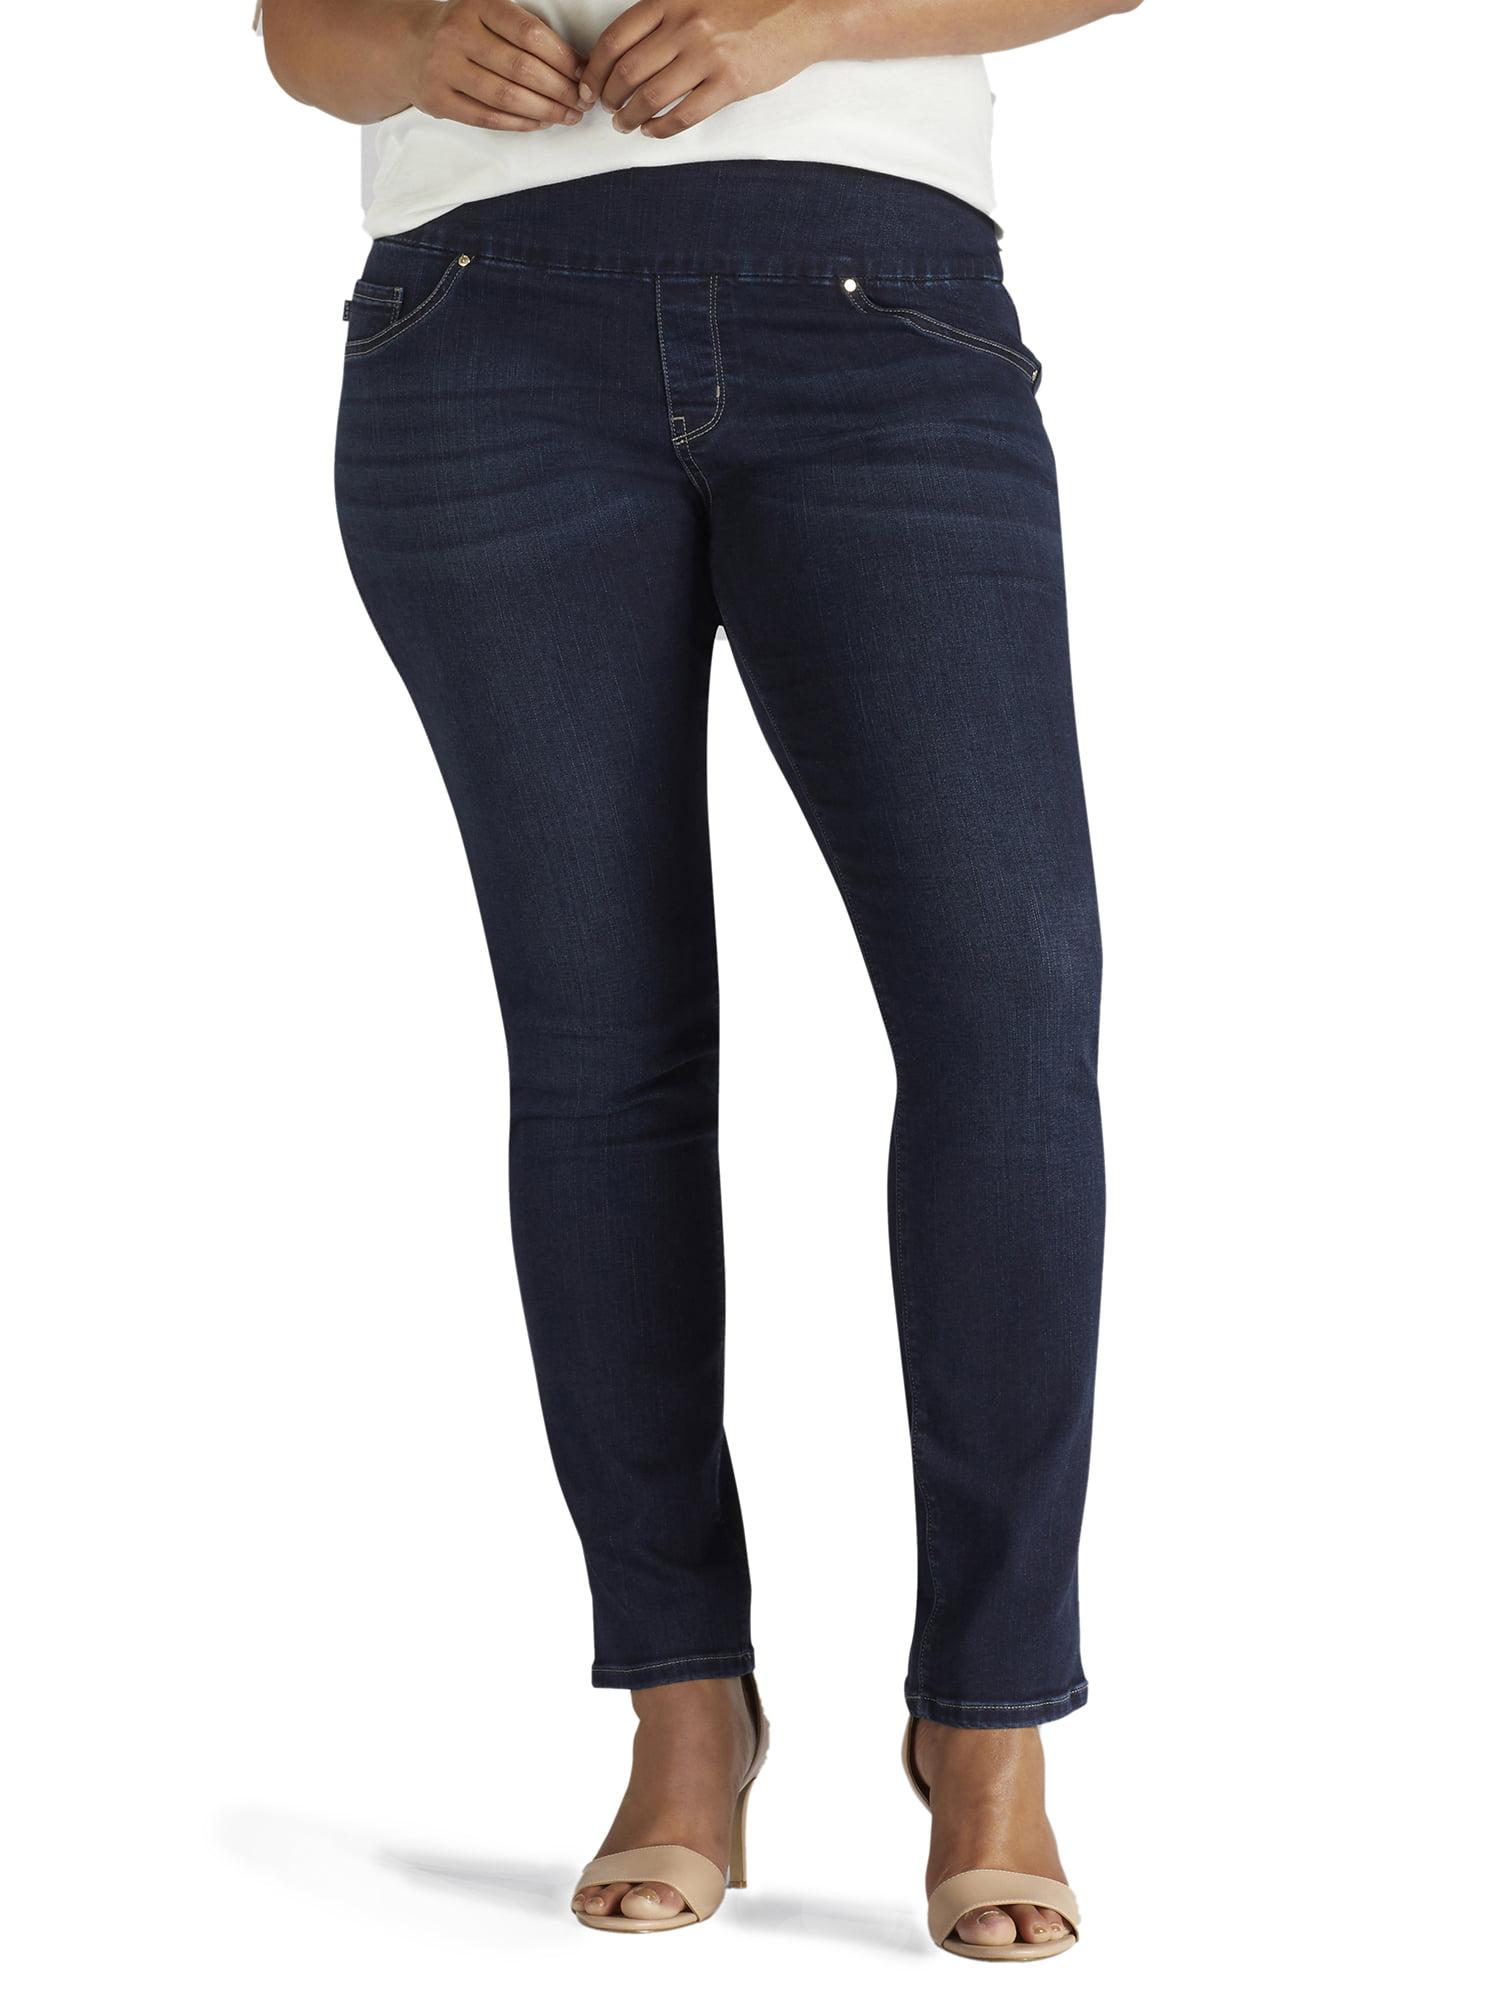 lee-petite-jeans-girl-is-dumb-free-pics